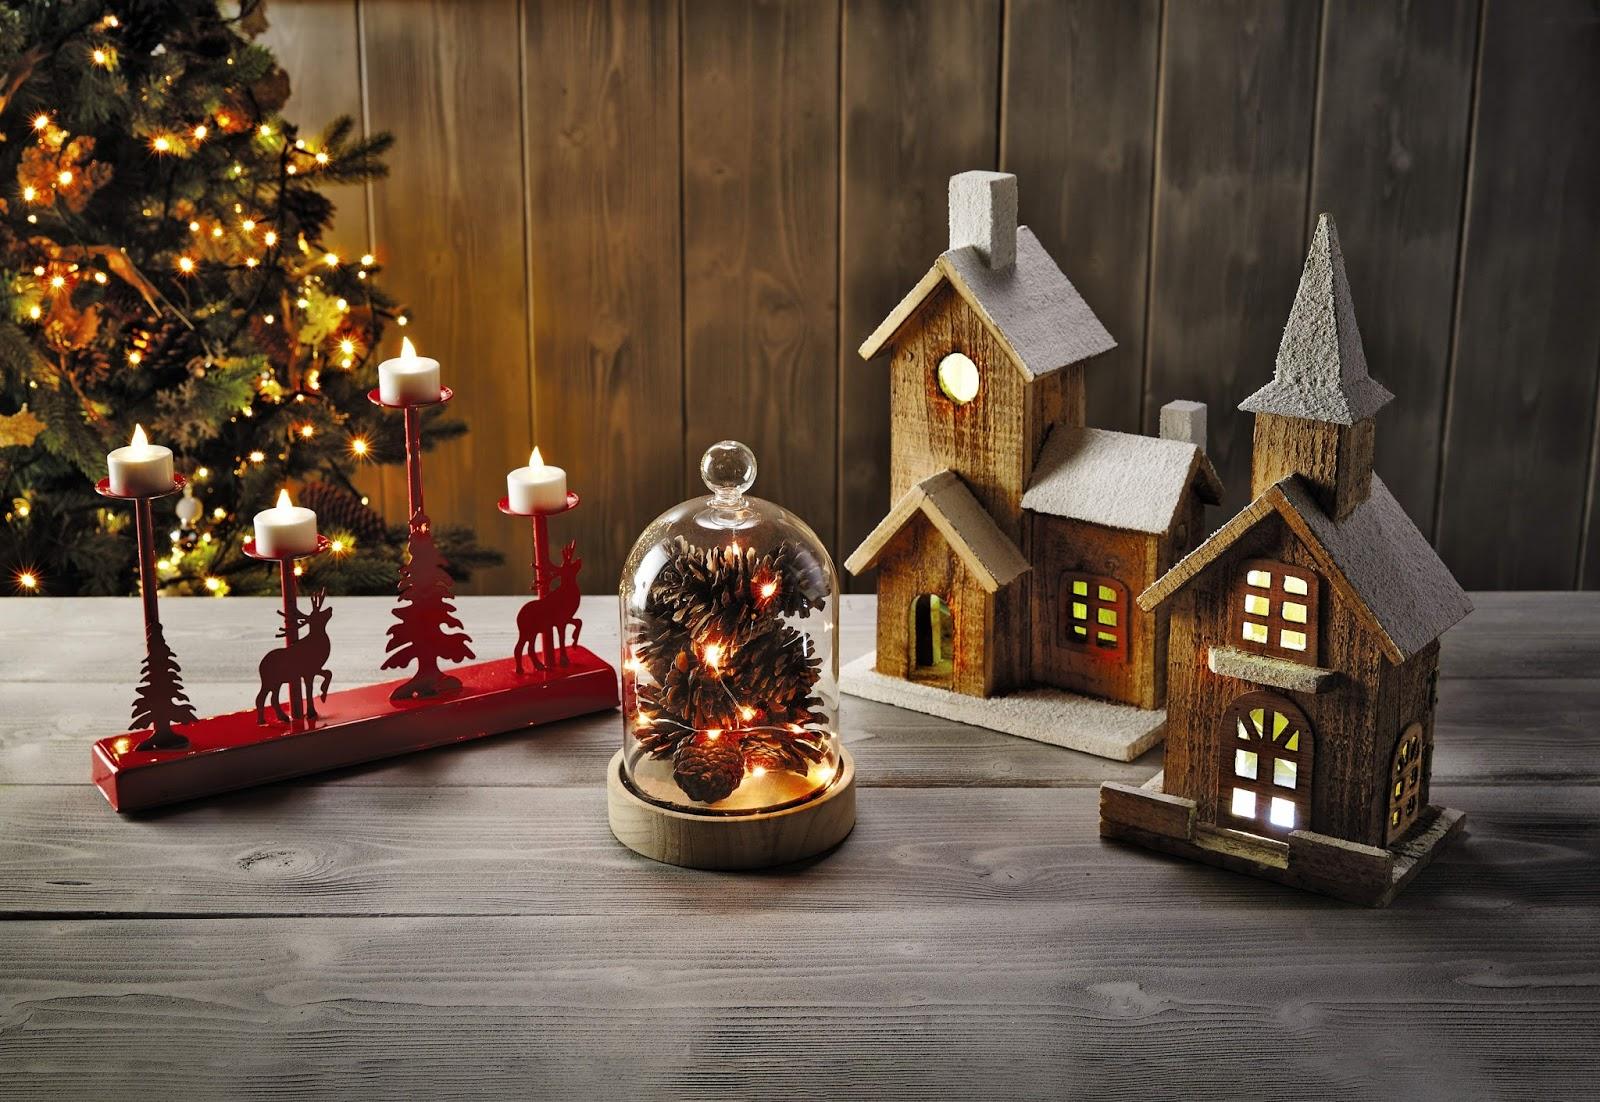 Aldi's Christmas Lights And Decorations...